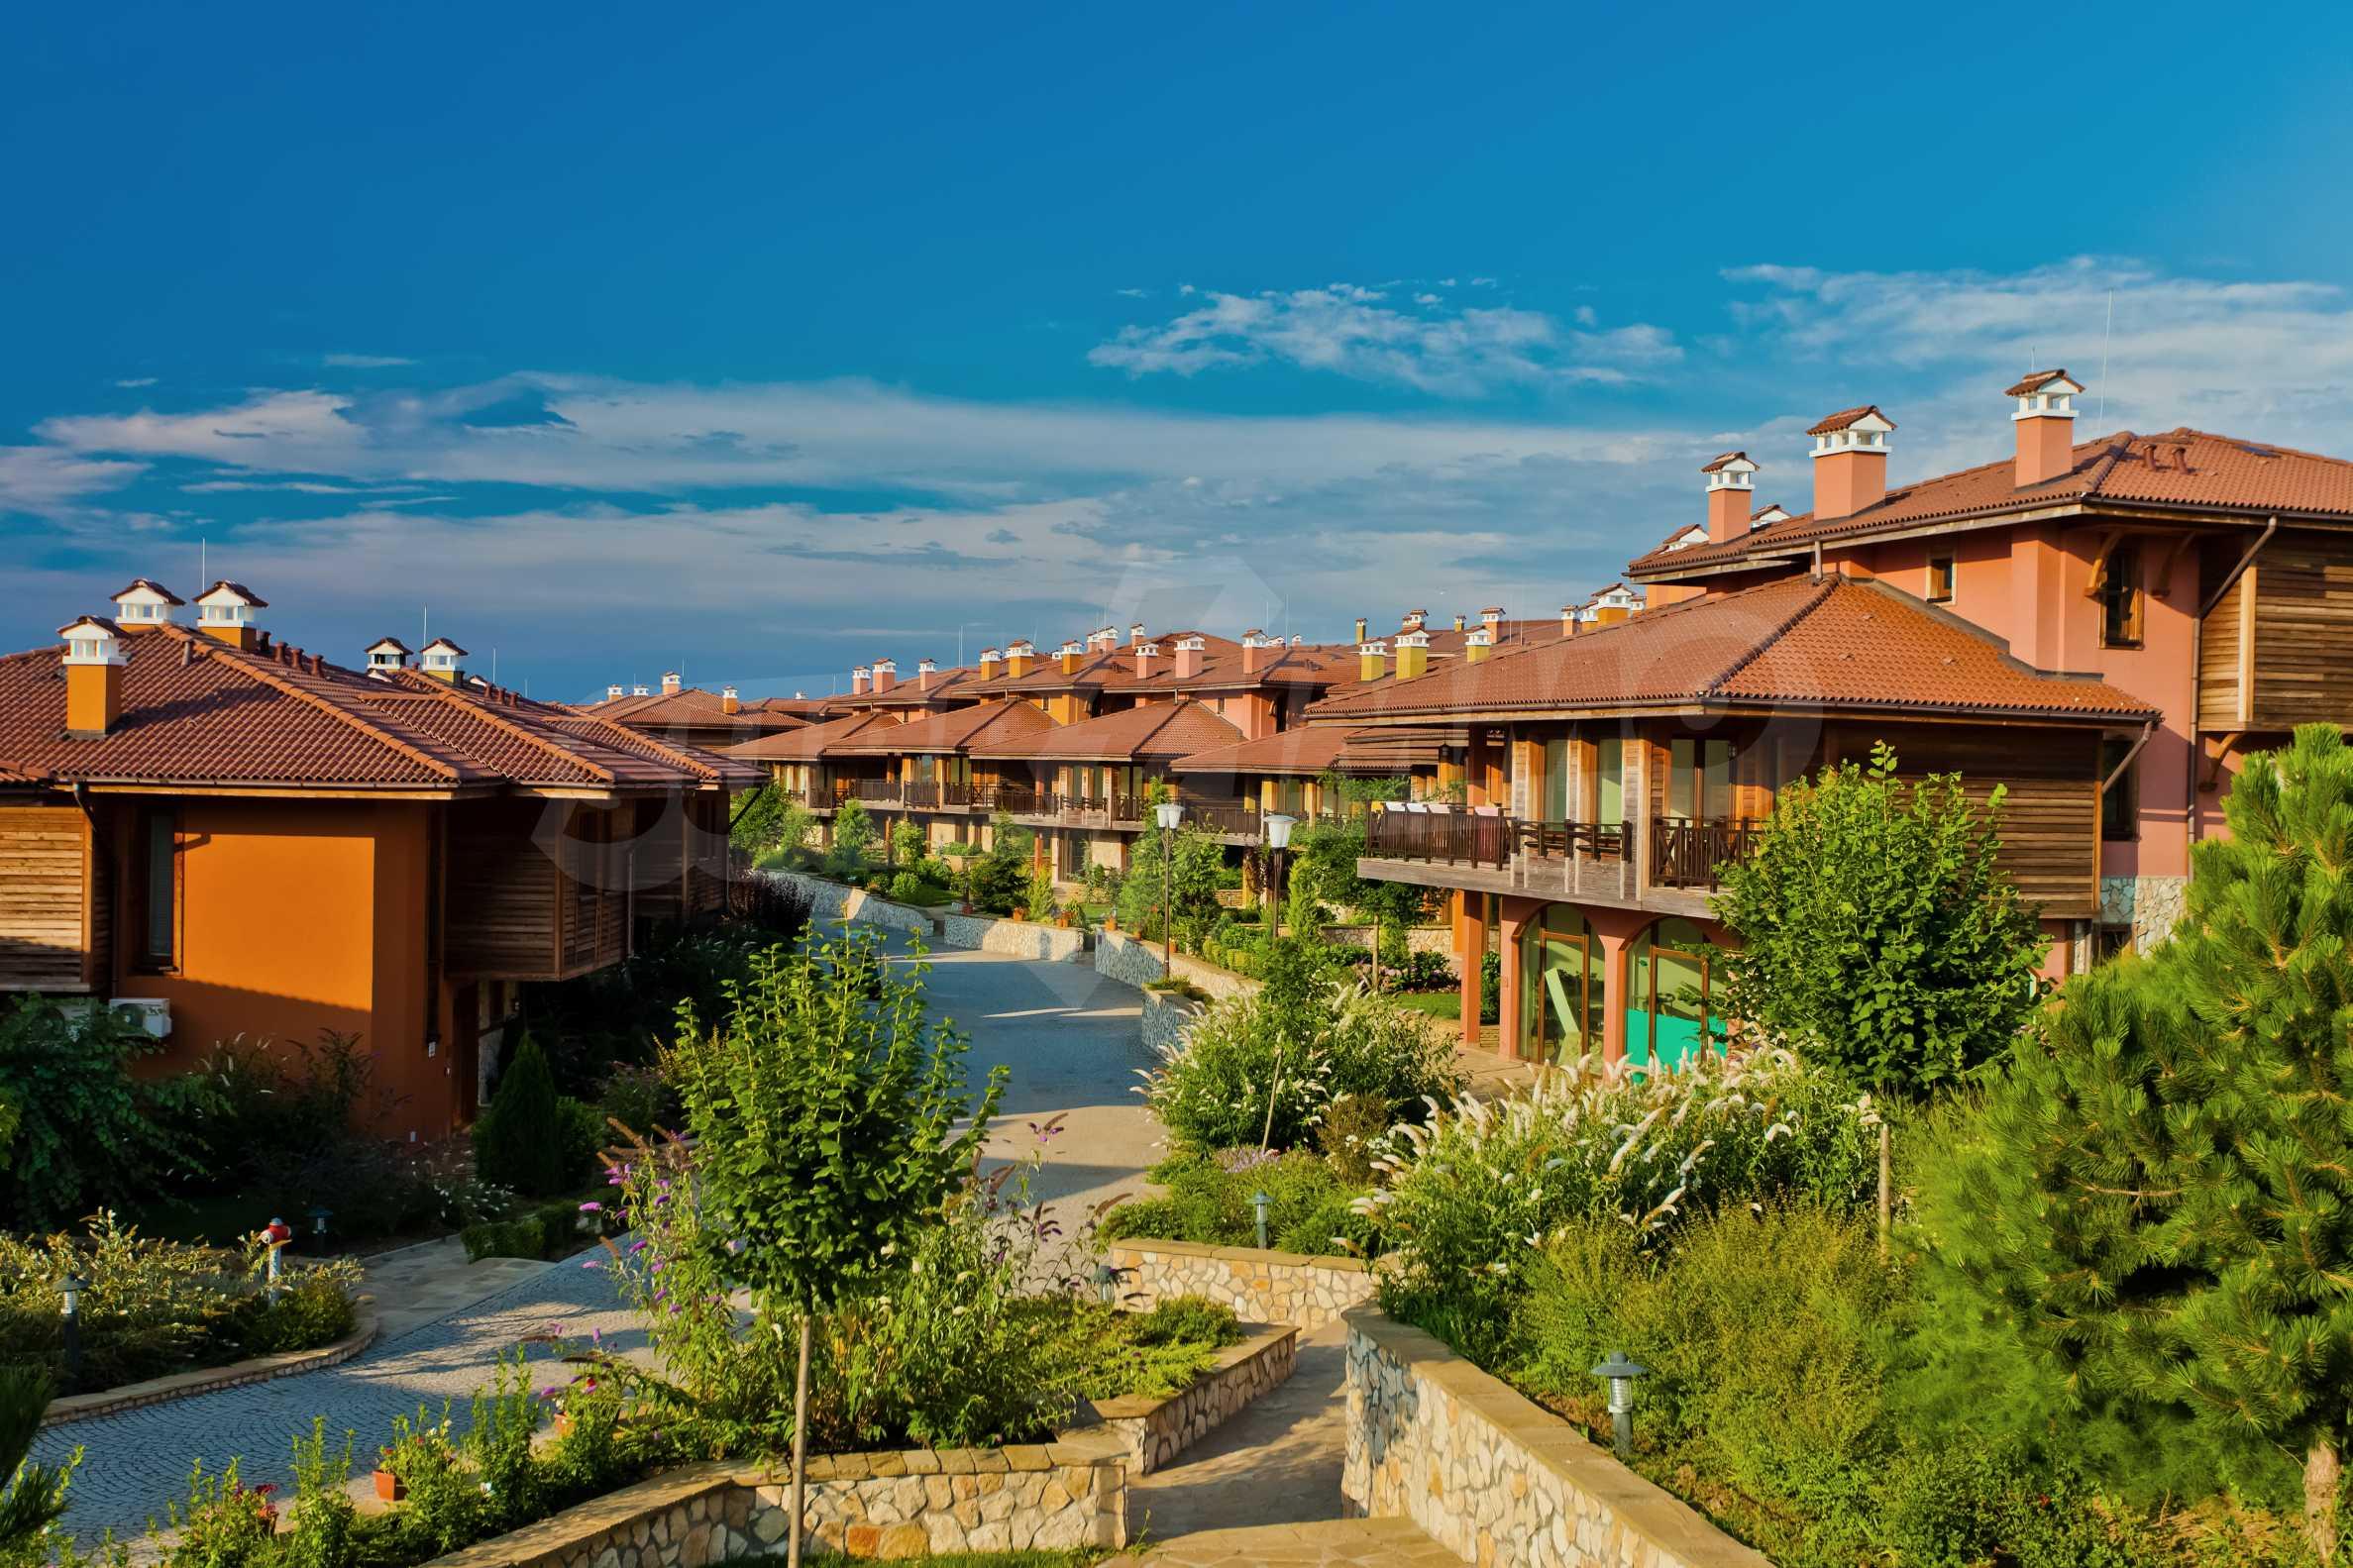 Sozopolis - unique coastal complex of duplex houses and apartments near Sozopol 2